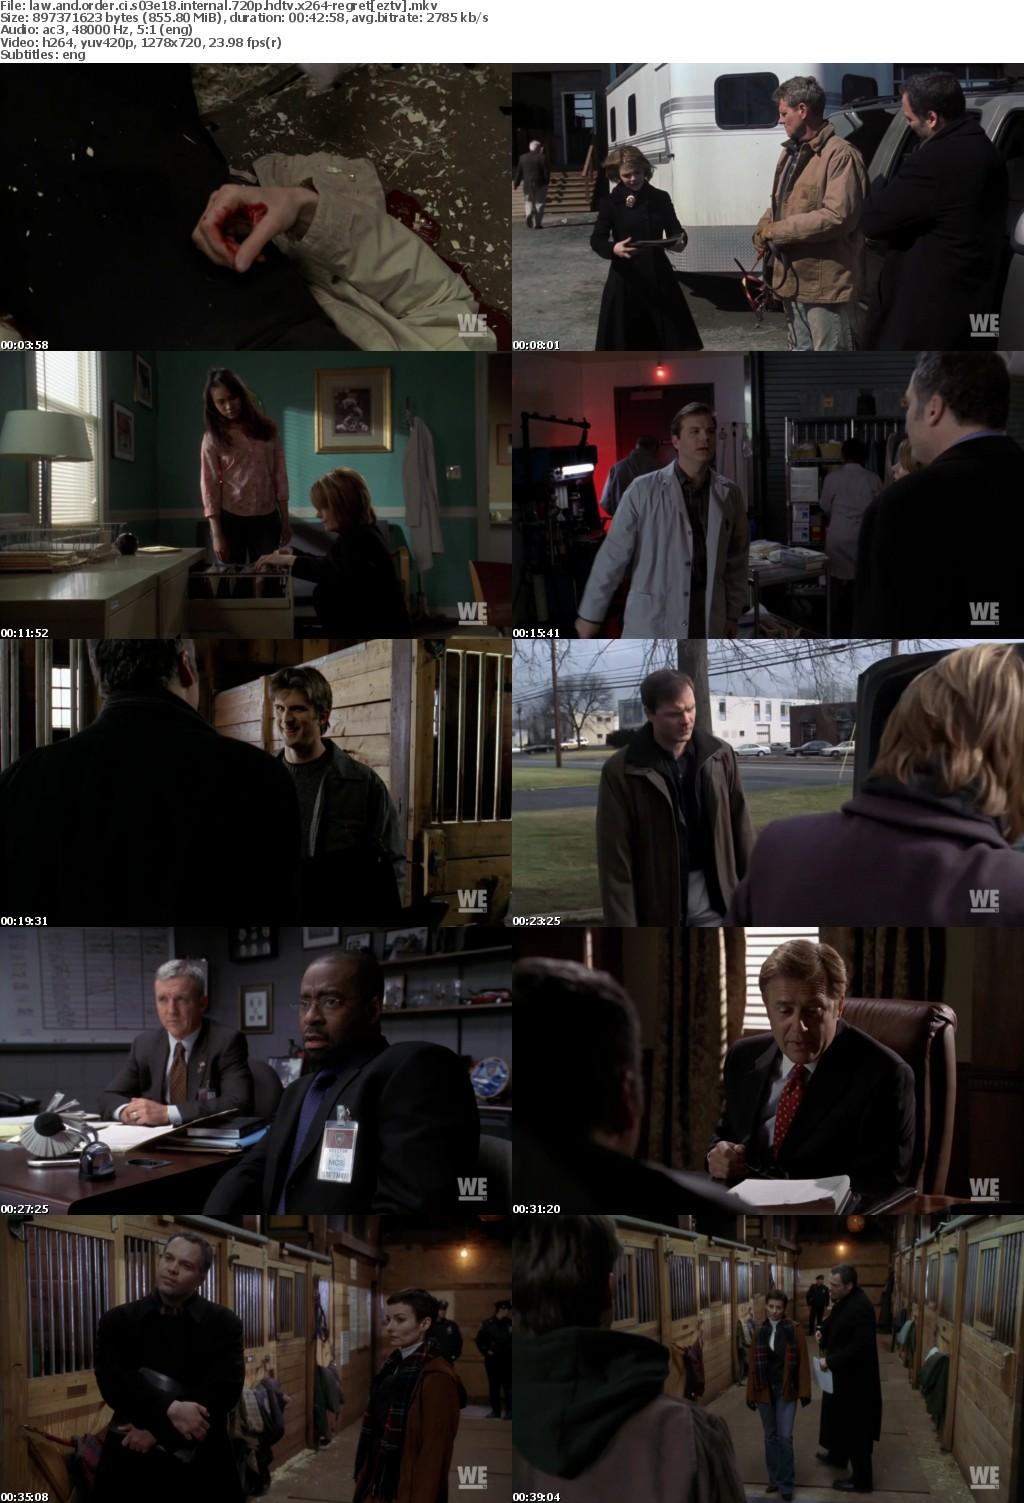 Law and Order CI S03E18 iNTERNAL 720p HDTV x264-REGRET